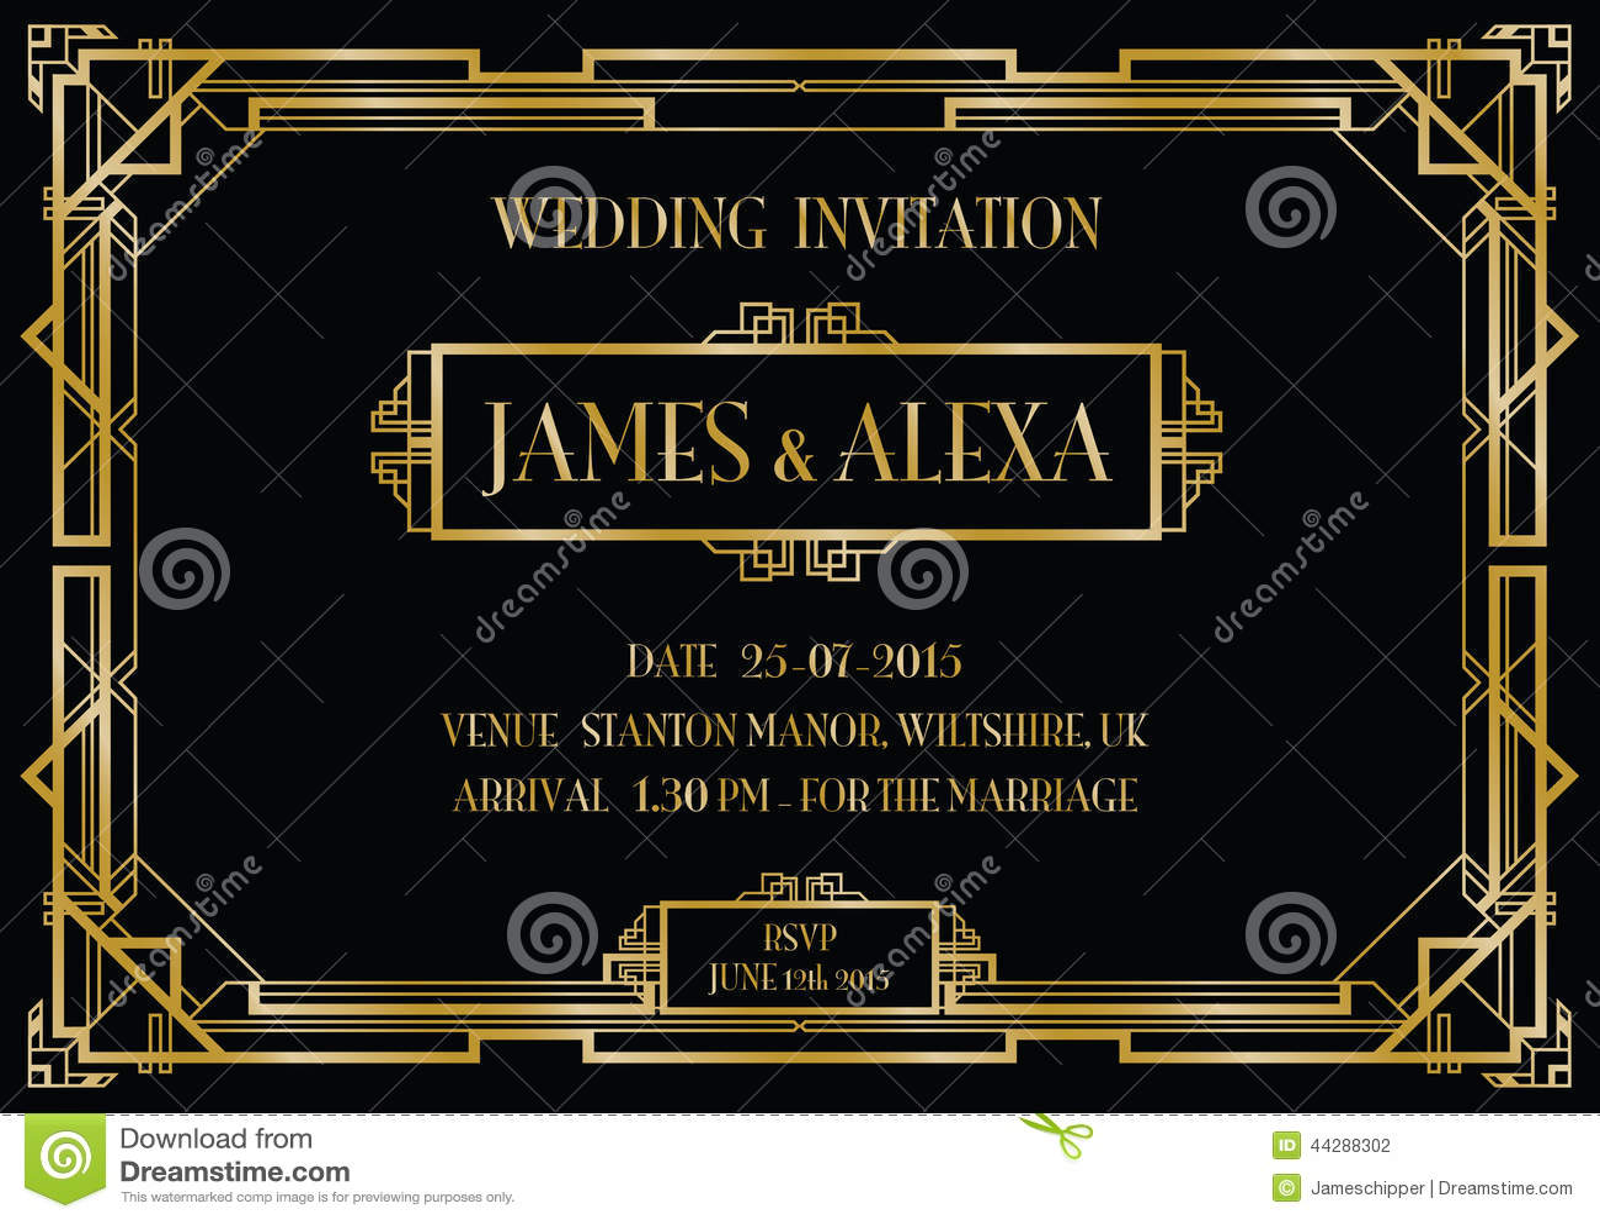 art deco style invitation card stock vector illustration of